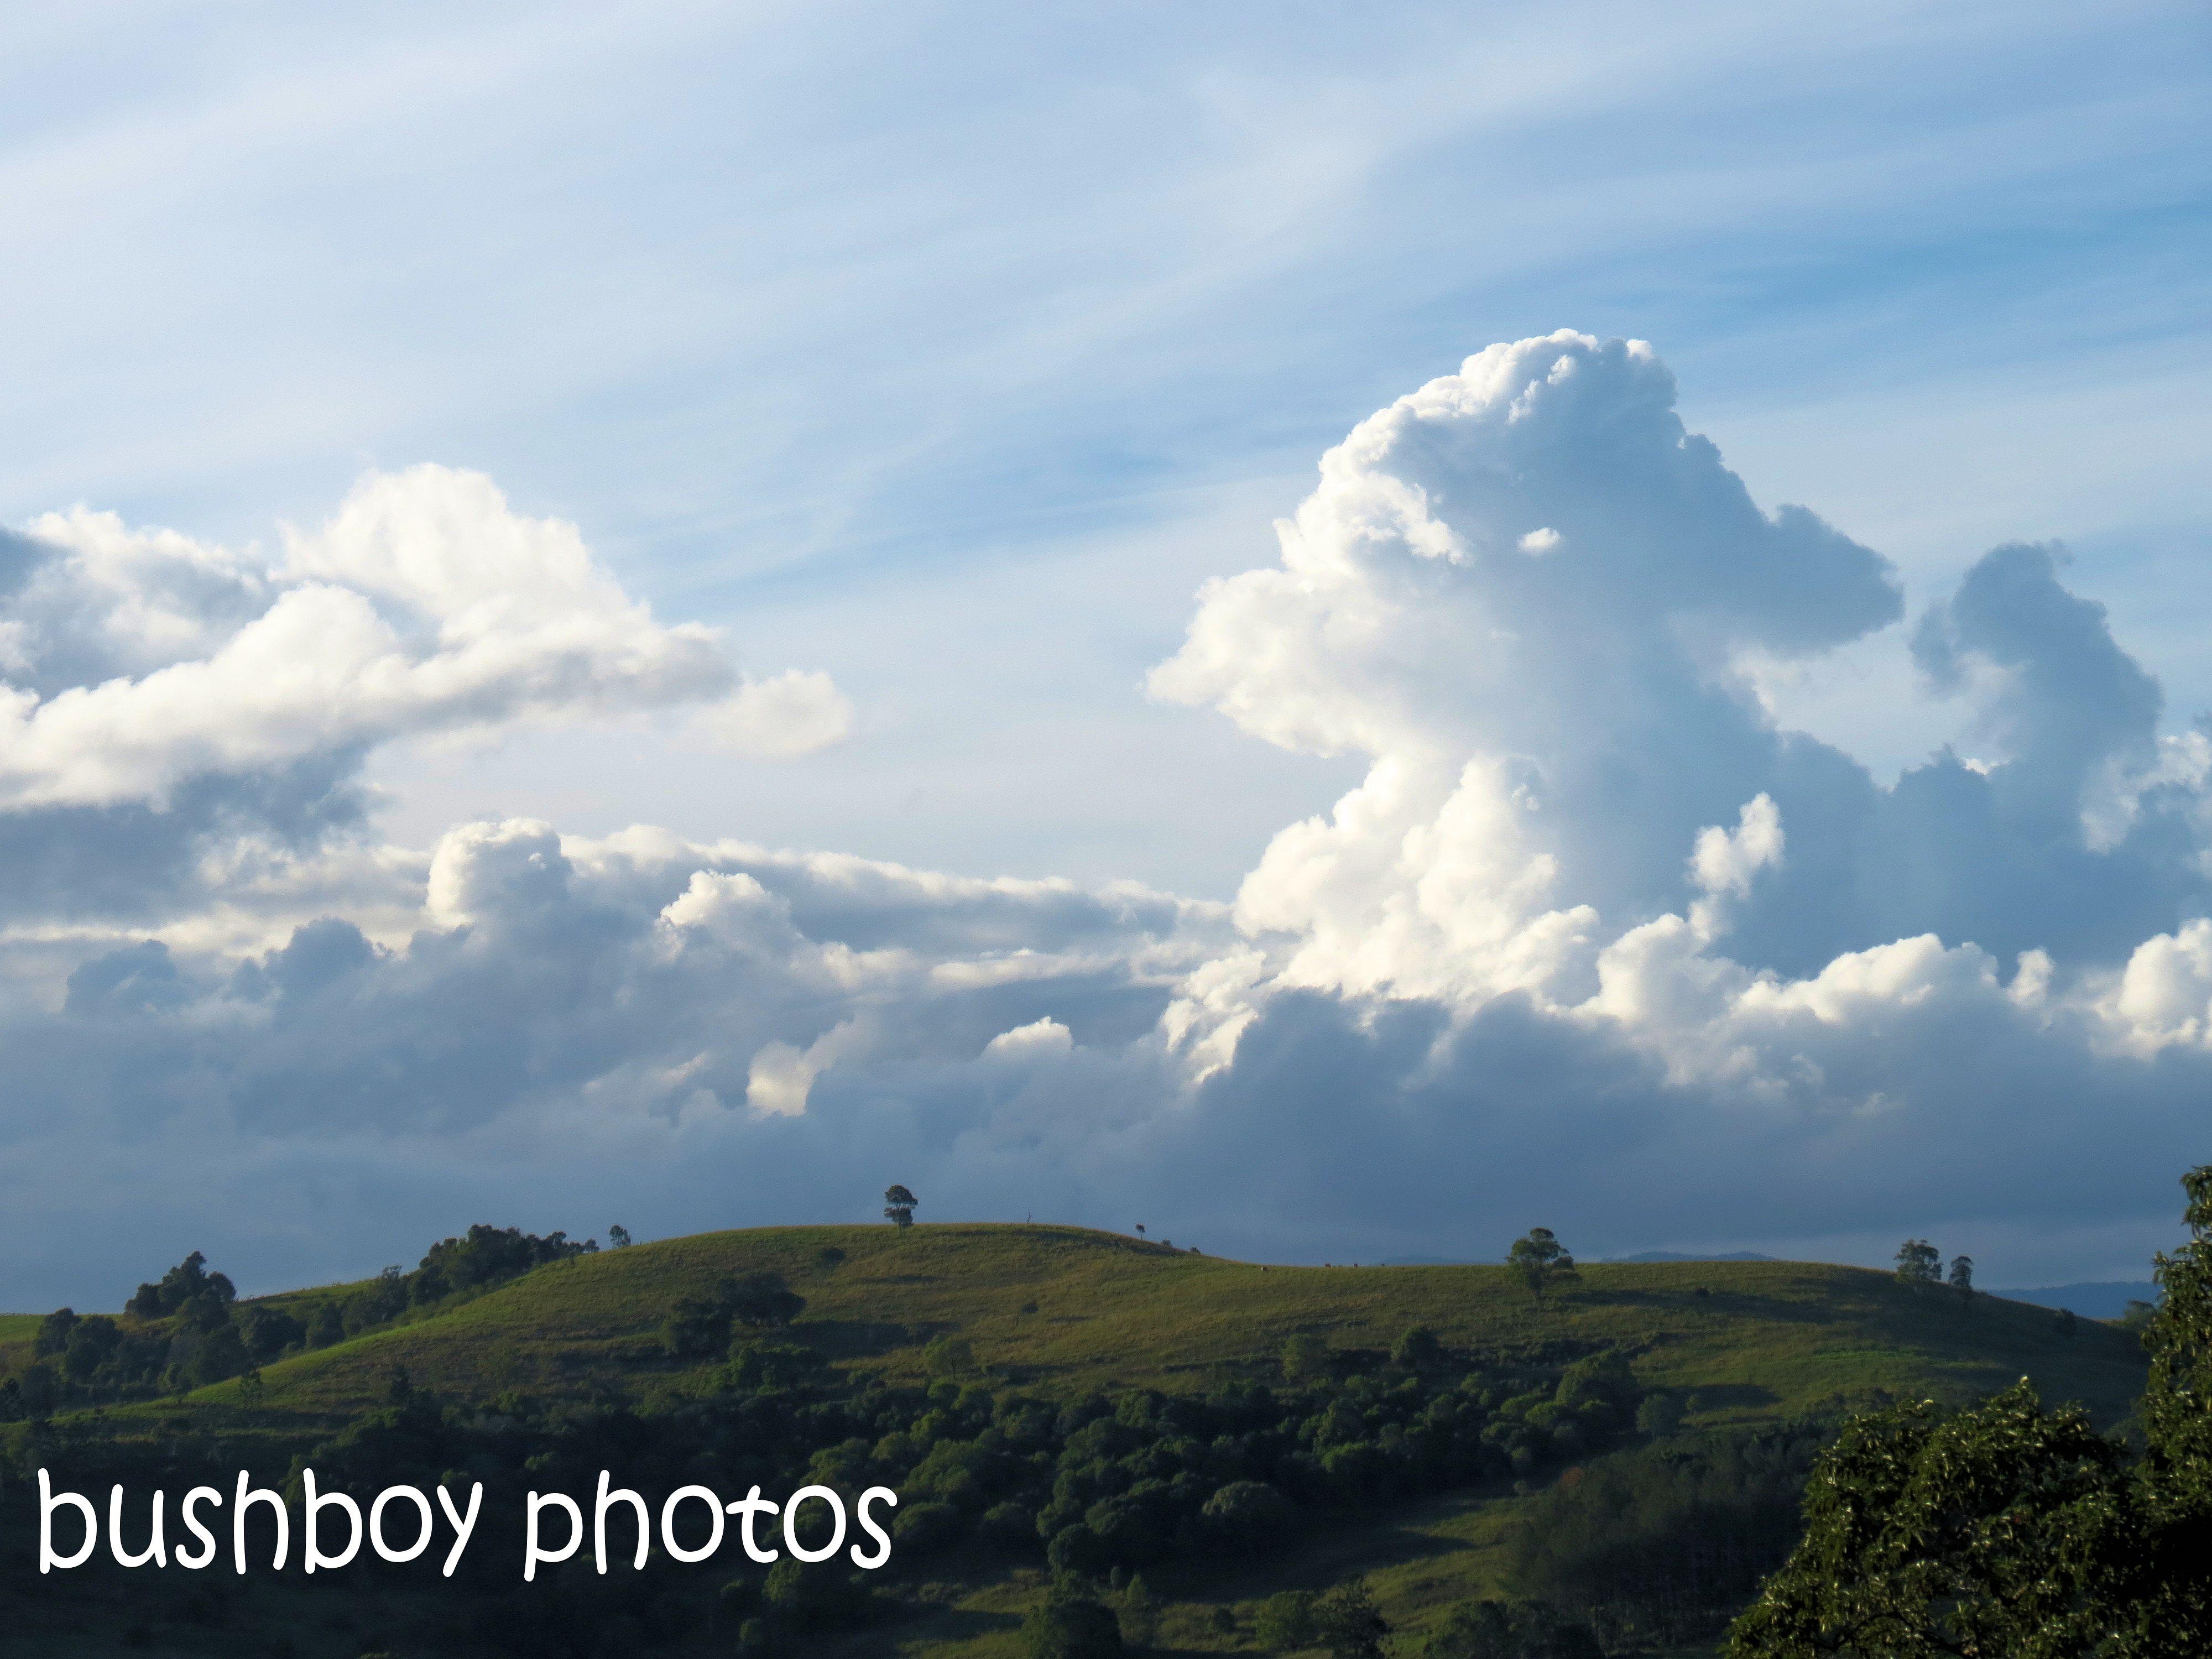 clouds_richmond catchment_named_june 2014